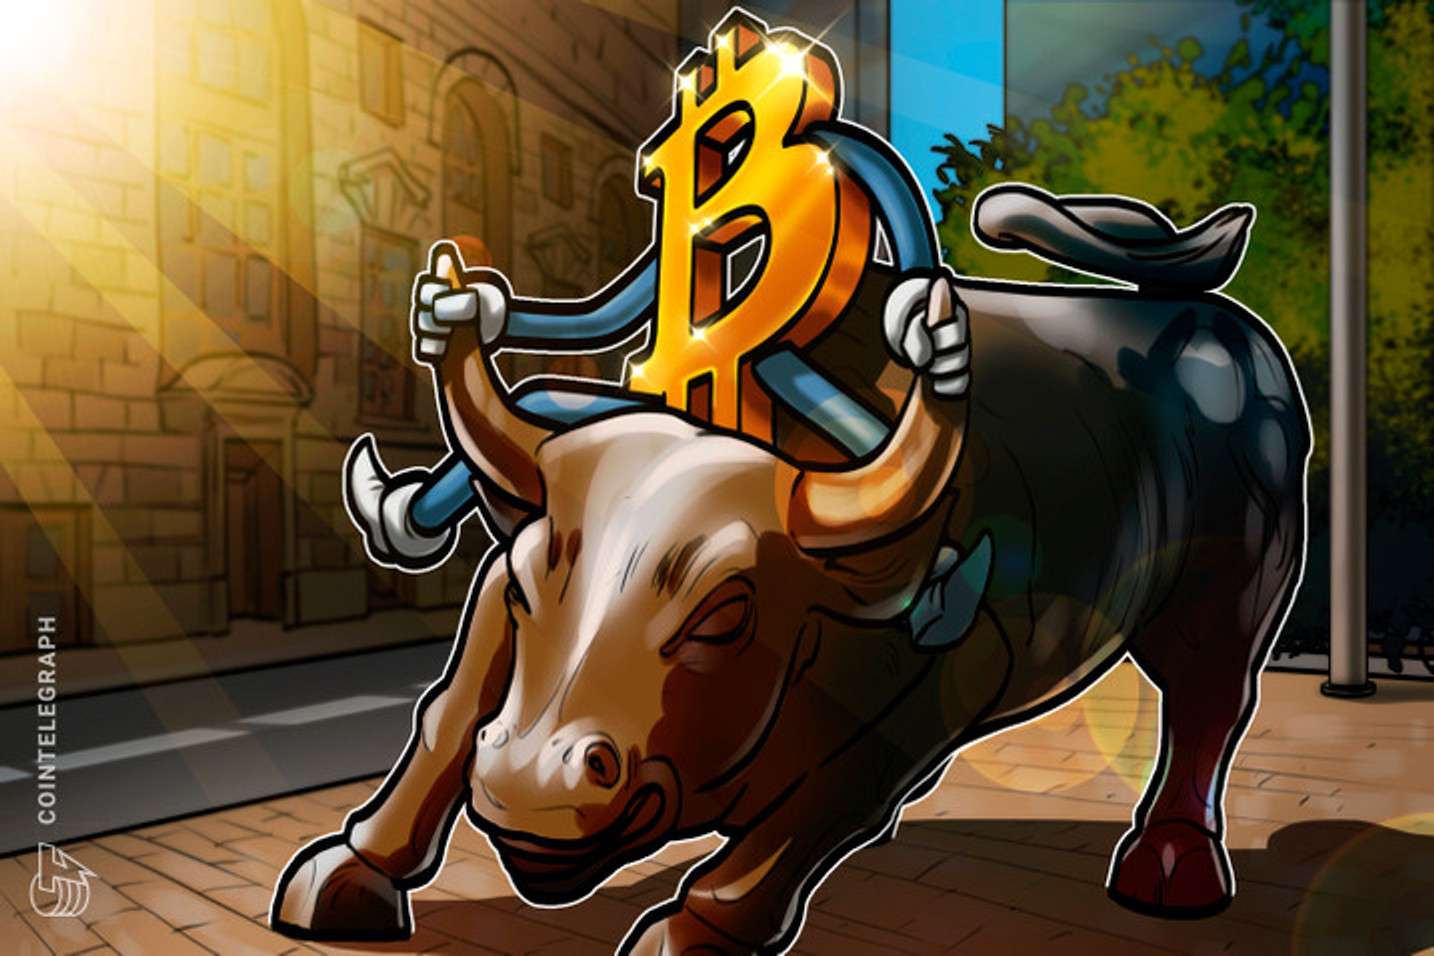 Comunidade cripto no Twitter comemora 'vitória moral' sobre Samy Dana depois de Bitcoin bater valor de aposta